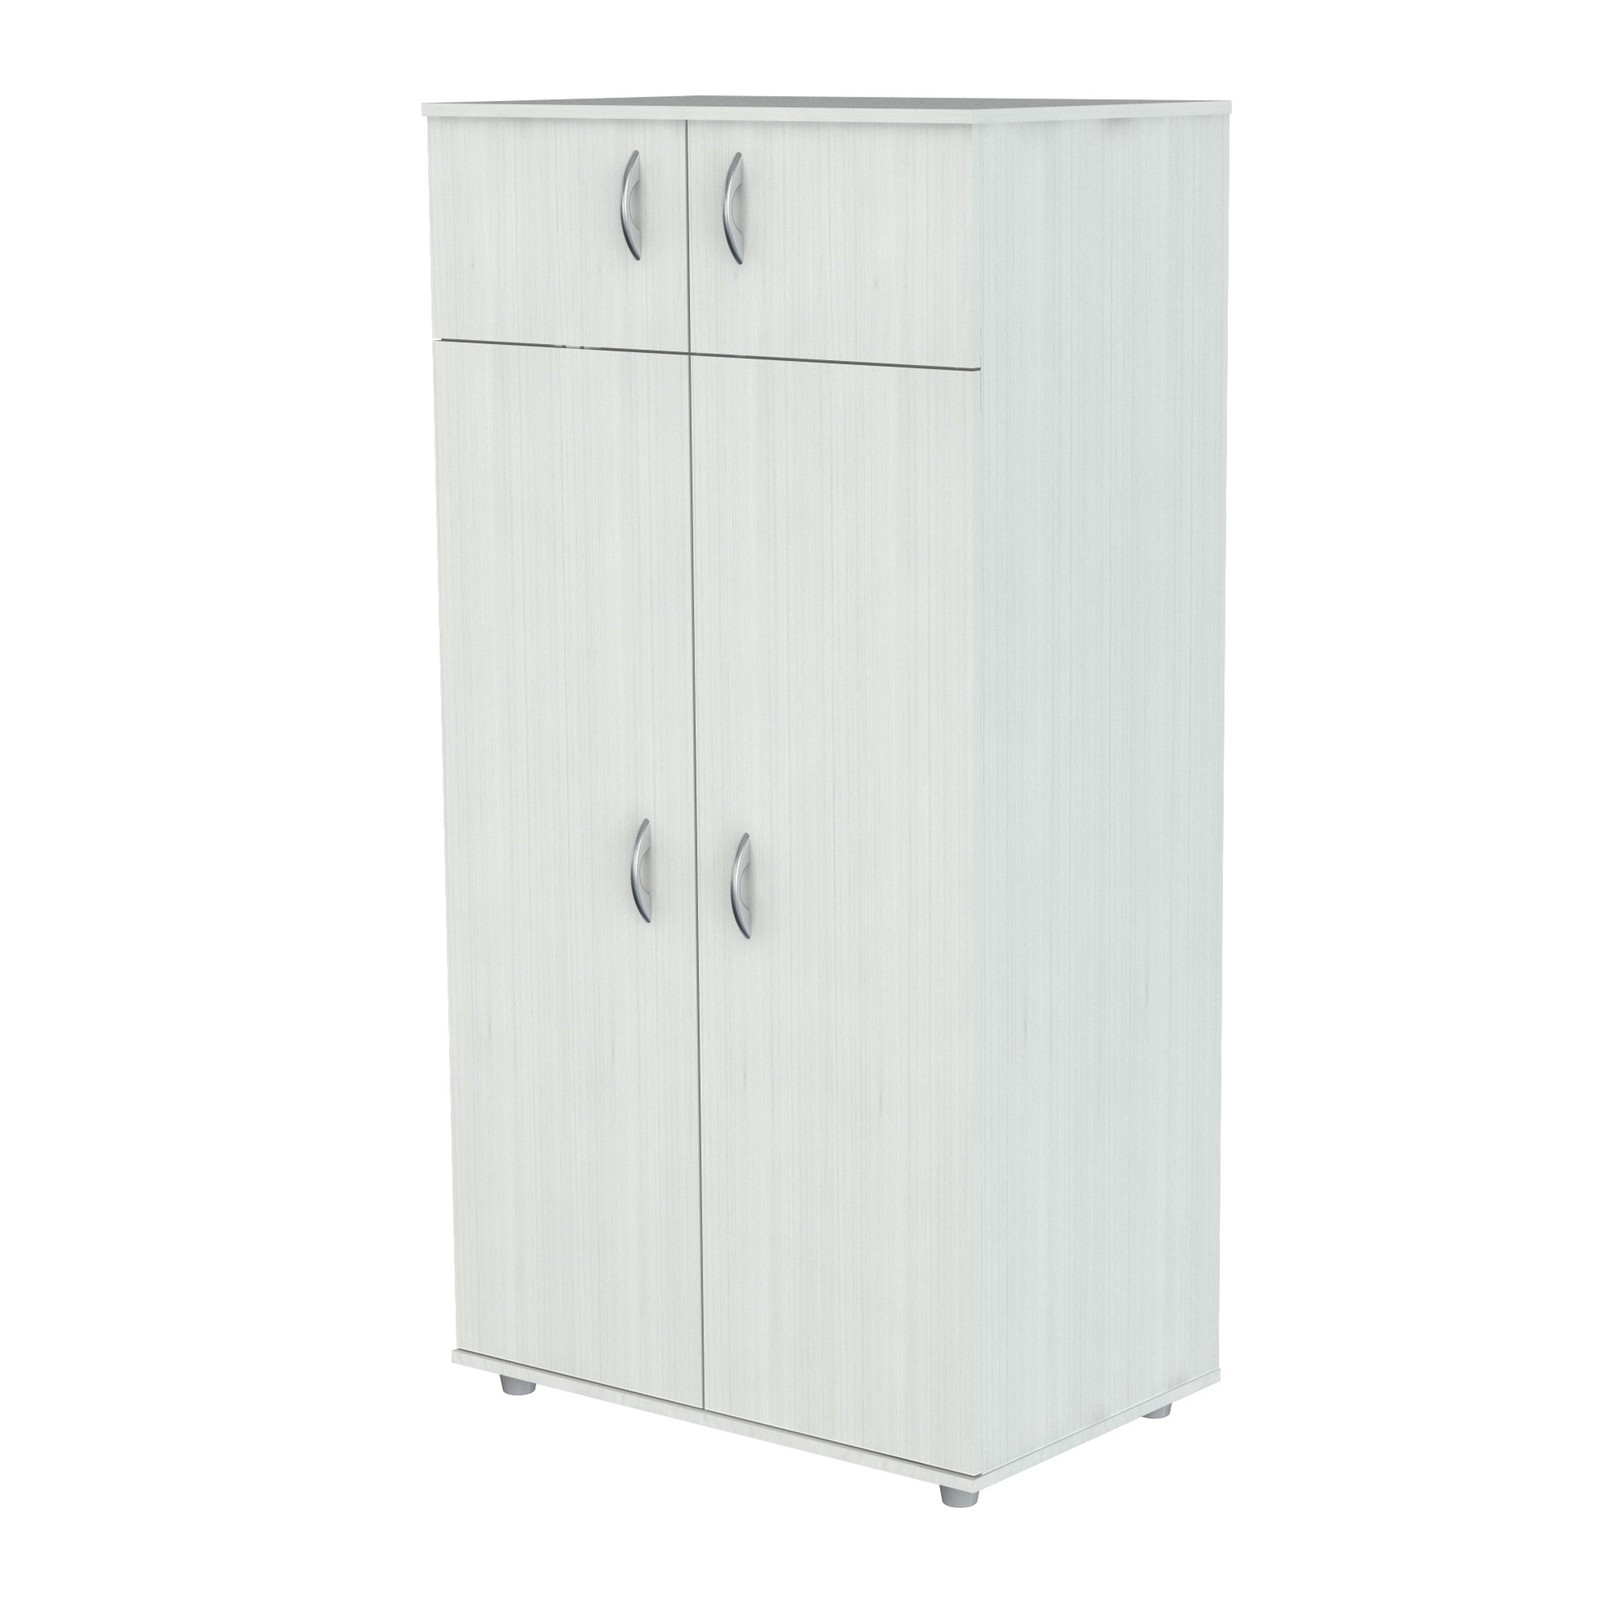 Wardrobe Cabinet 32 Inch Wide Double Door Storage Cabinet ...